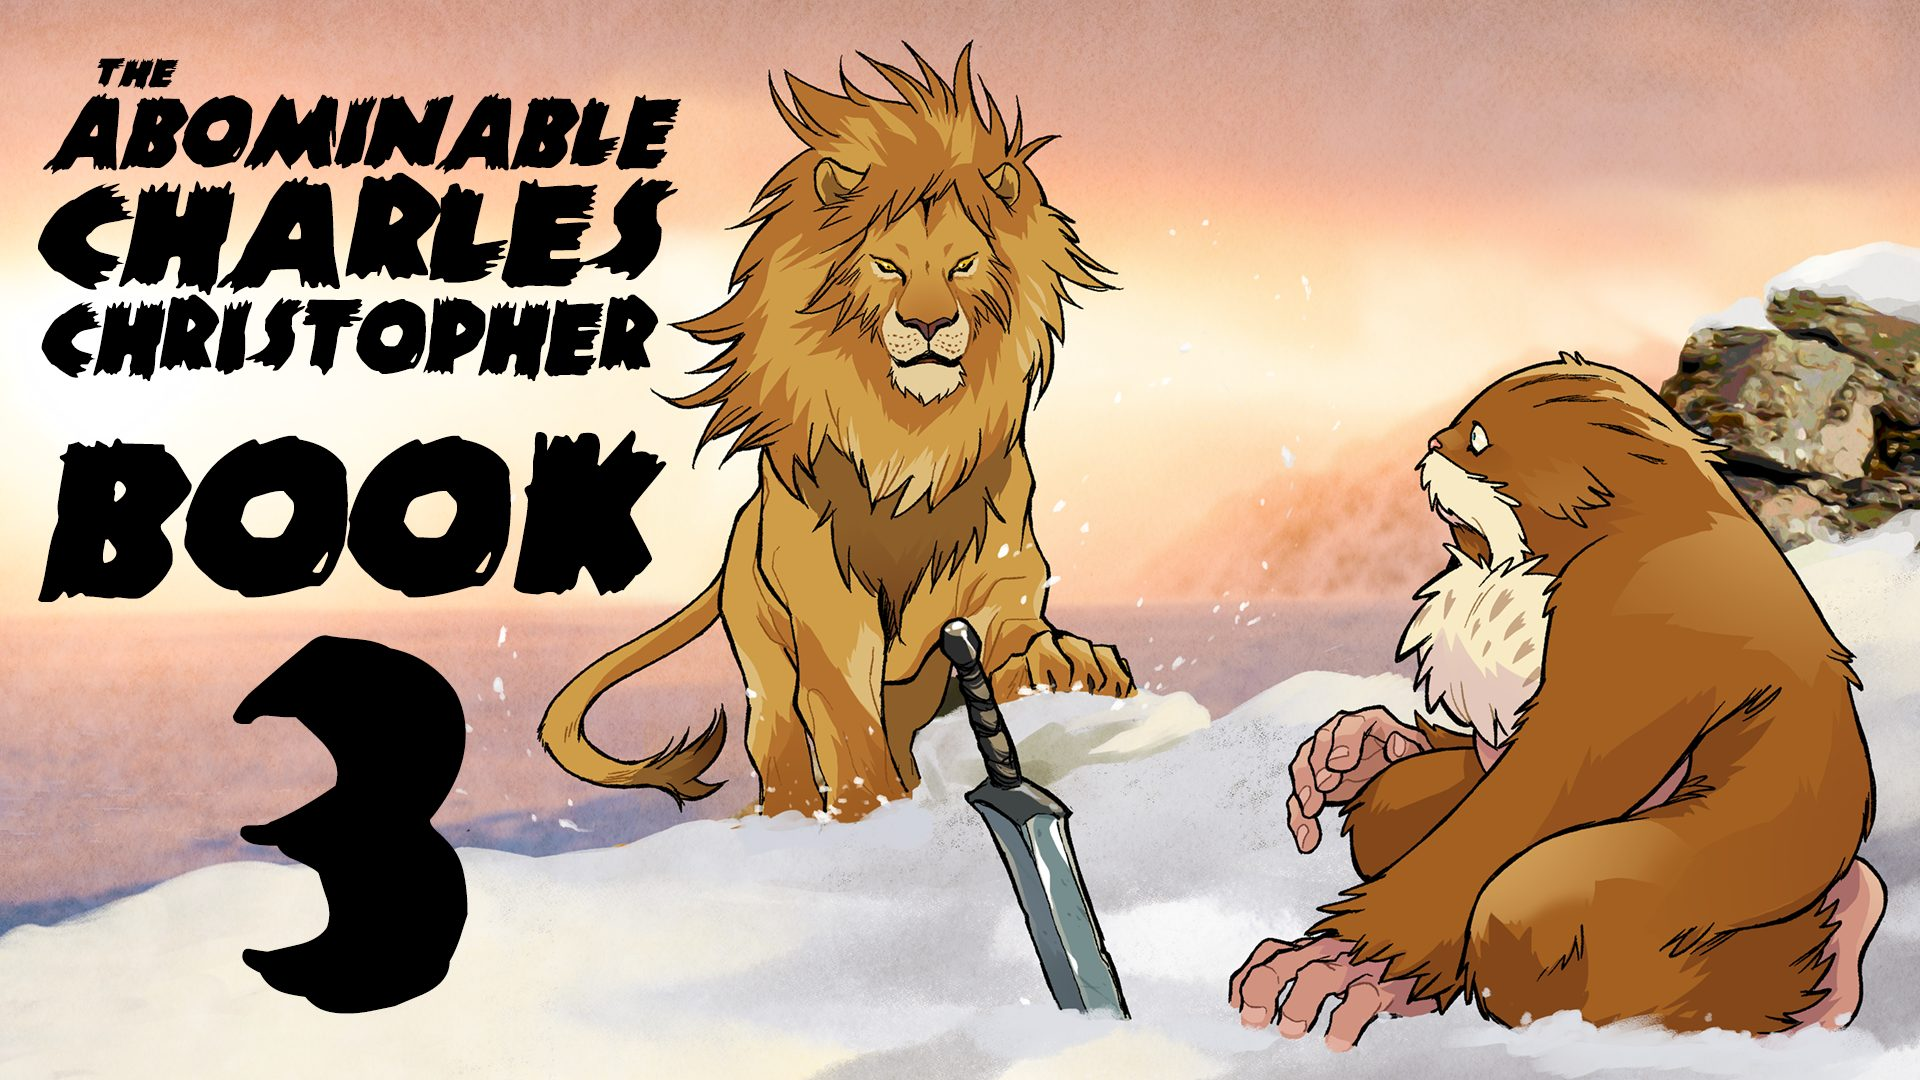 abominable Book 3 Kickstarter